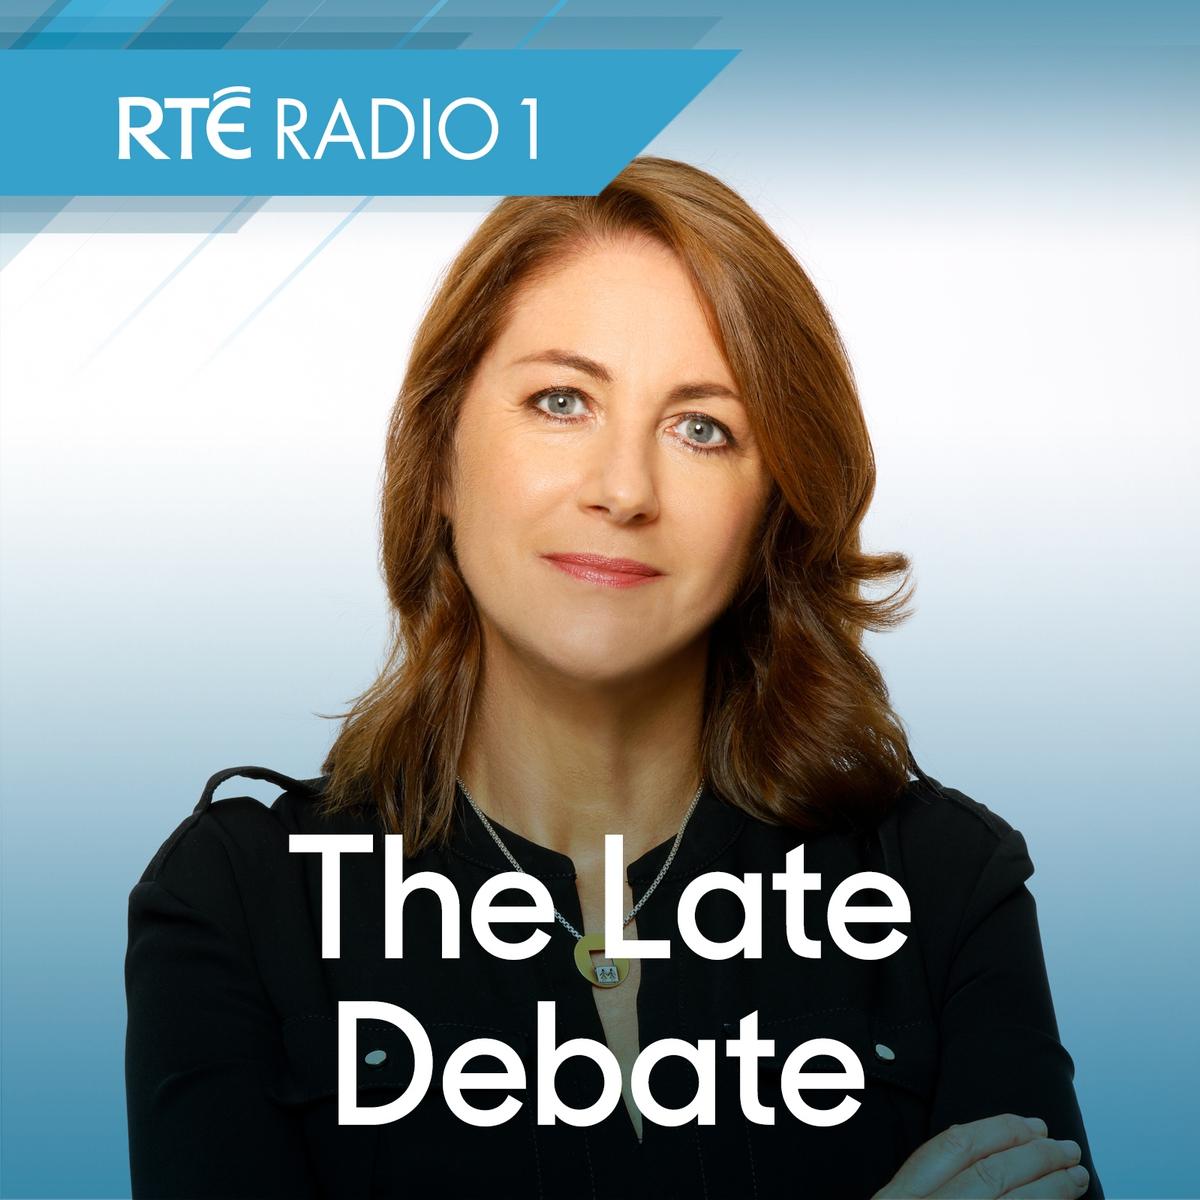 The Late Debate